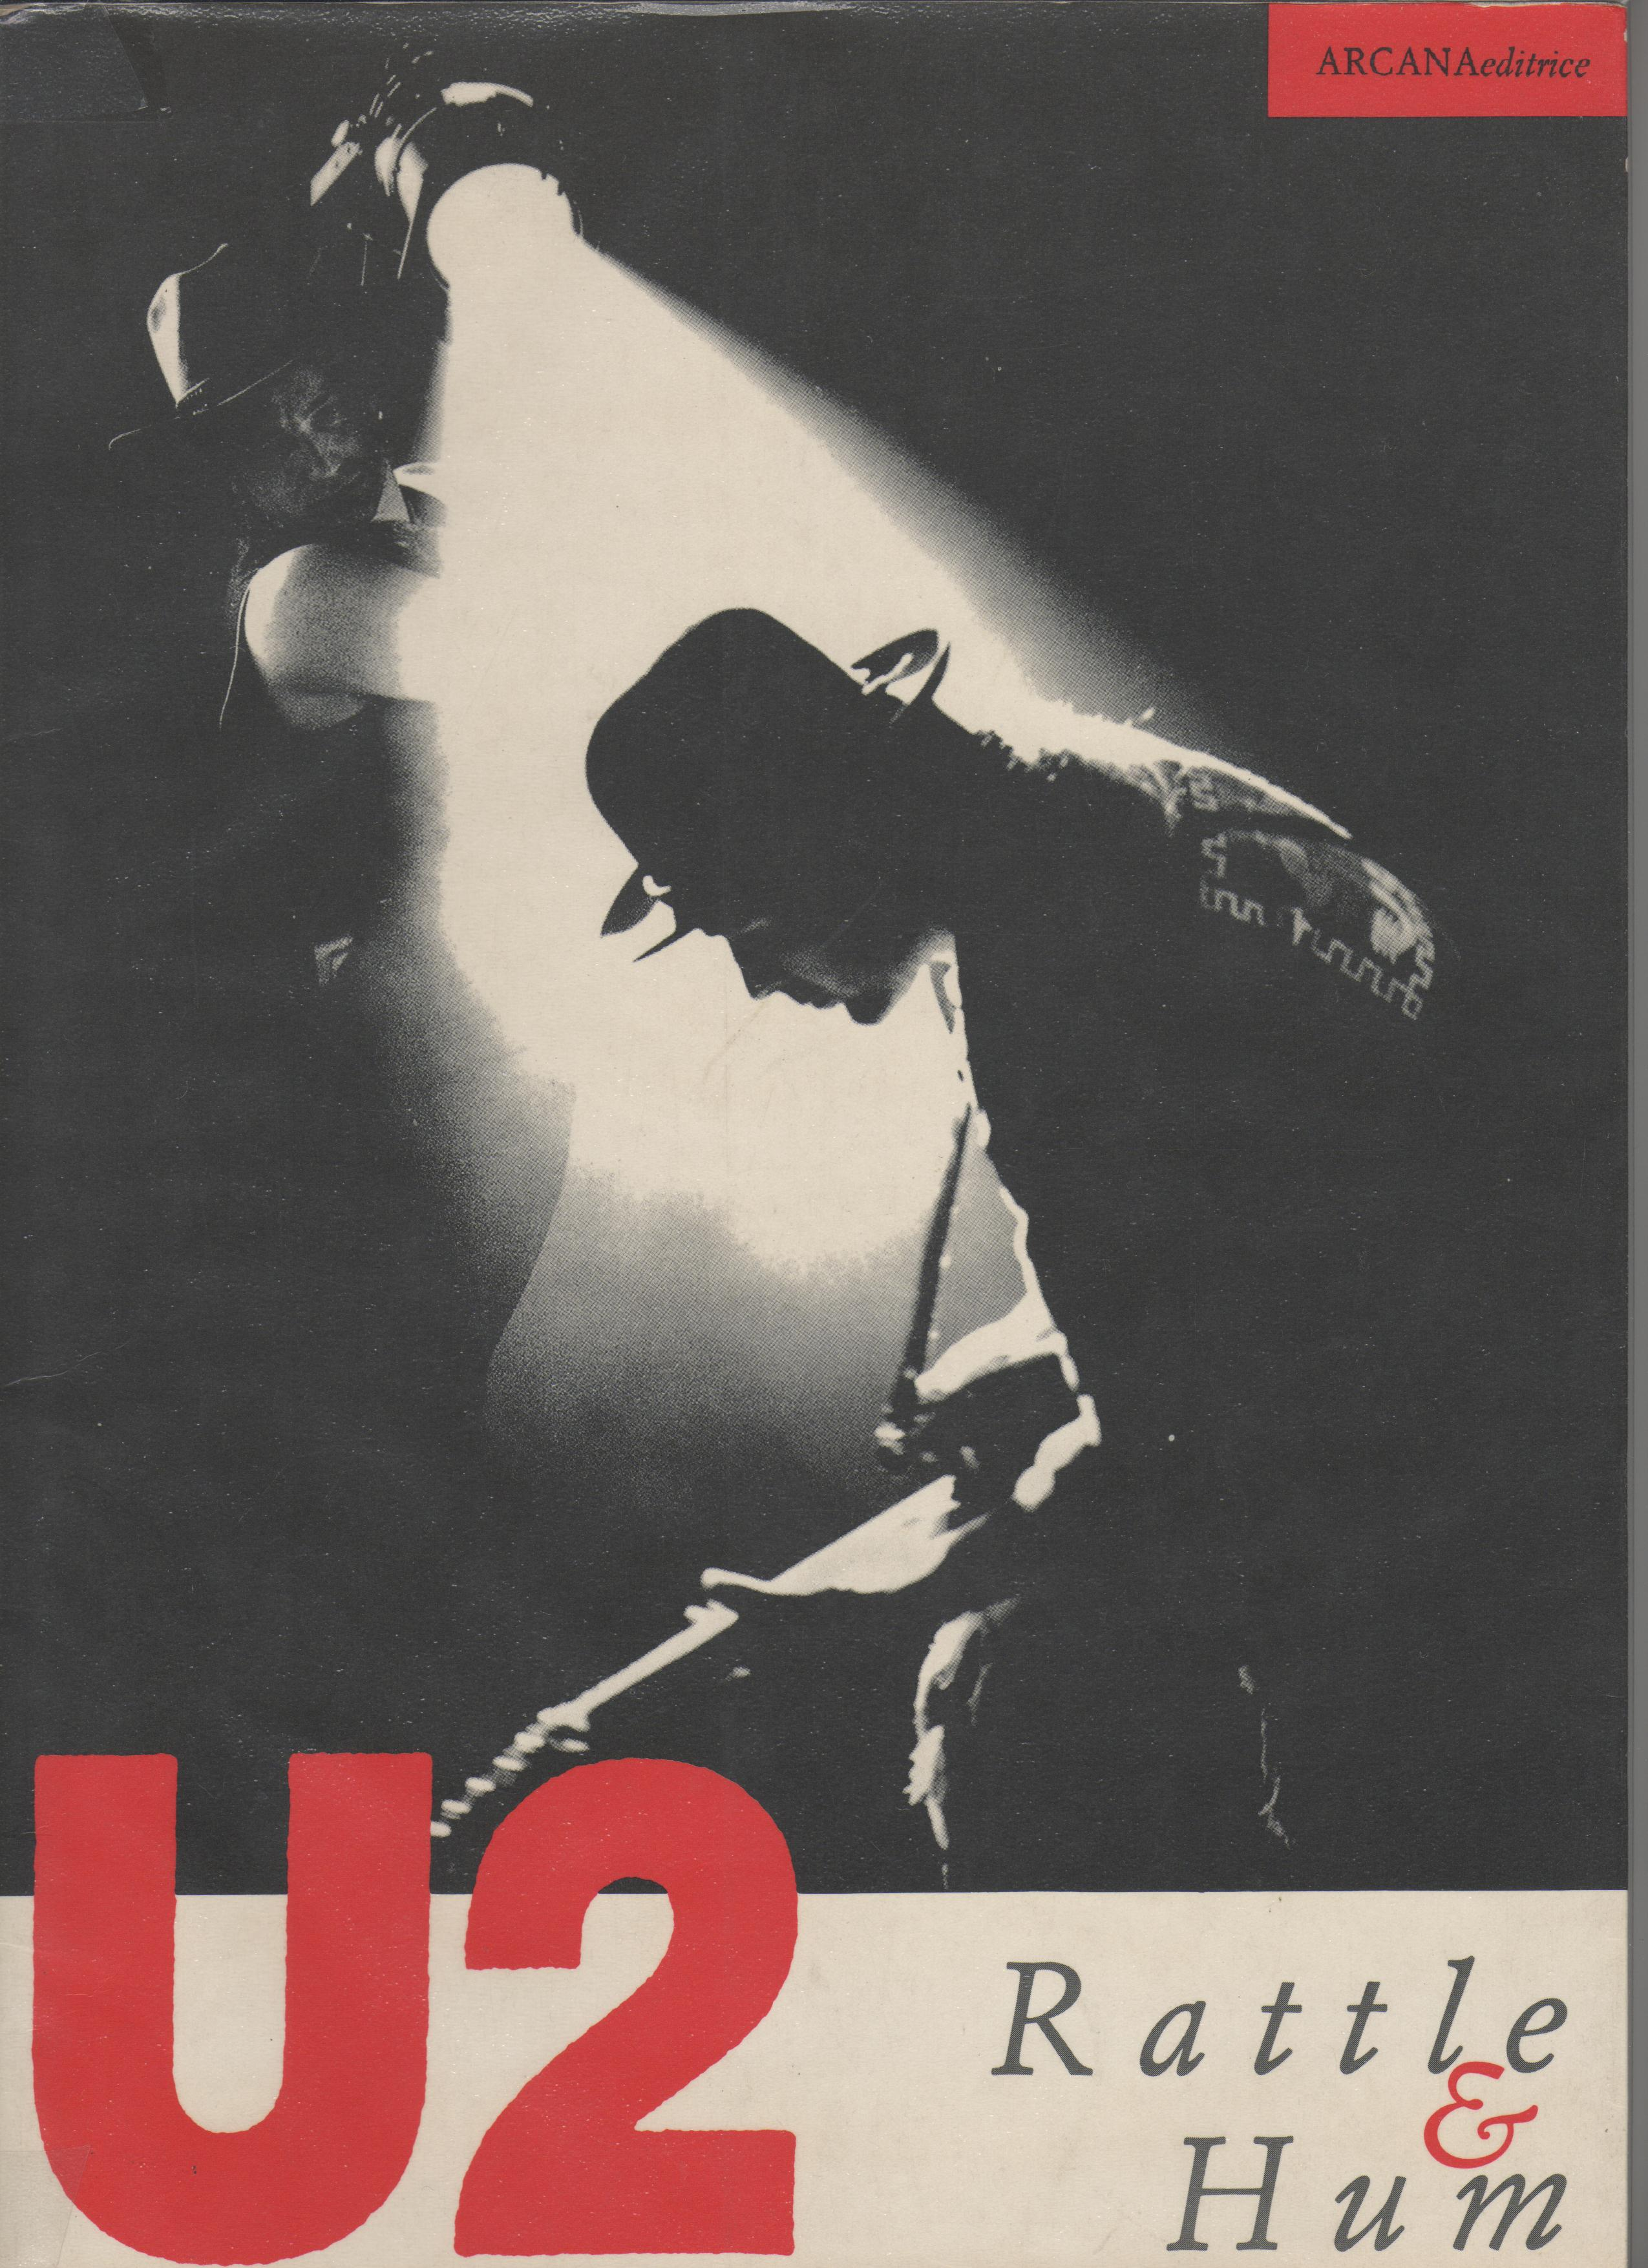 U2. Rattle & hum